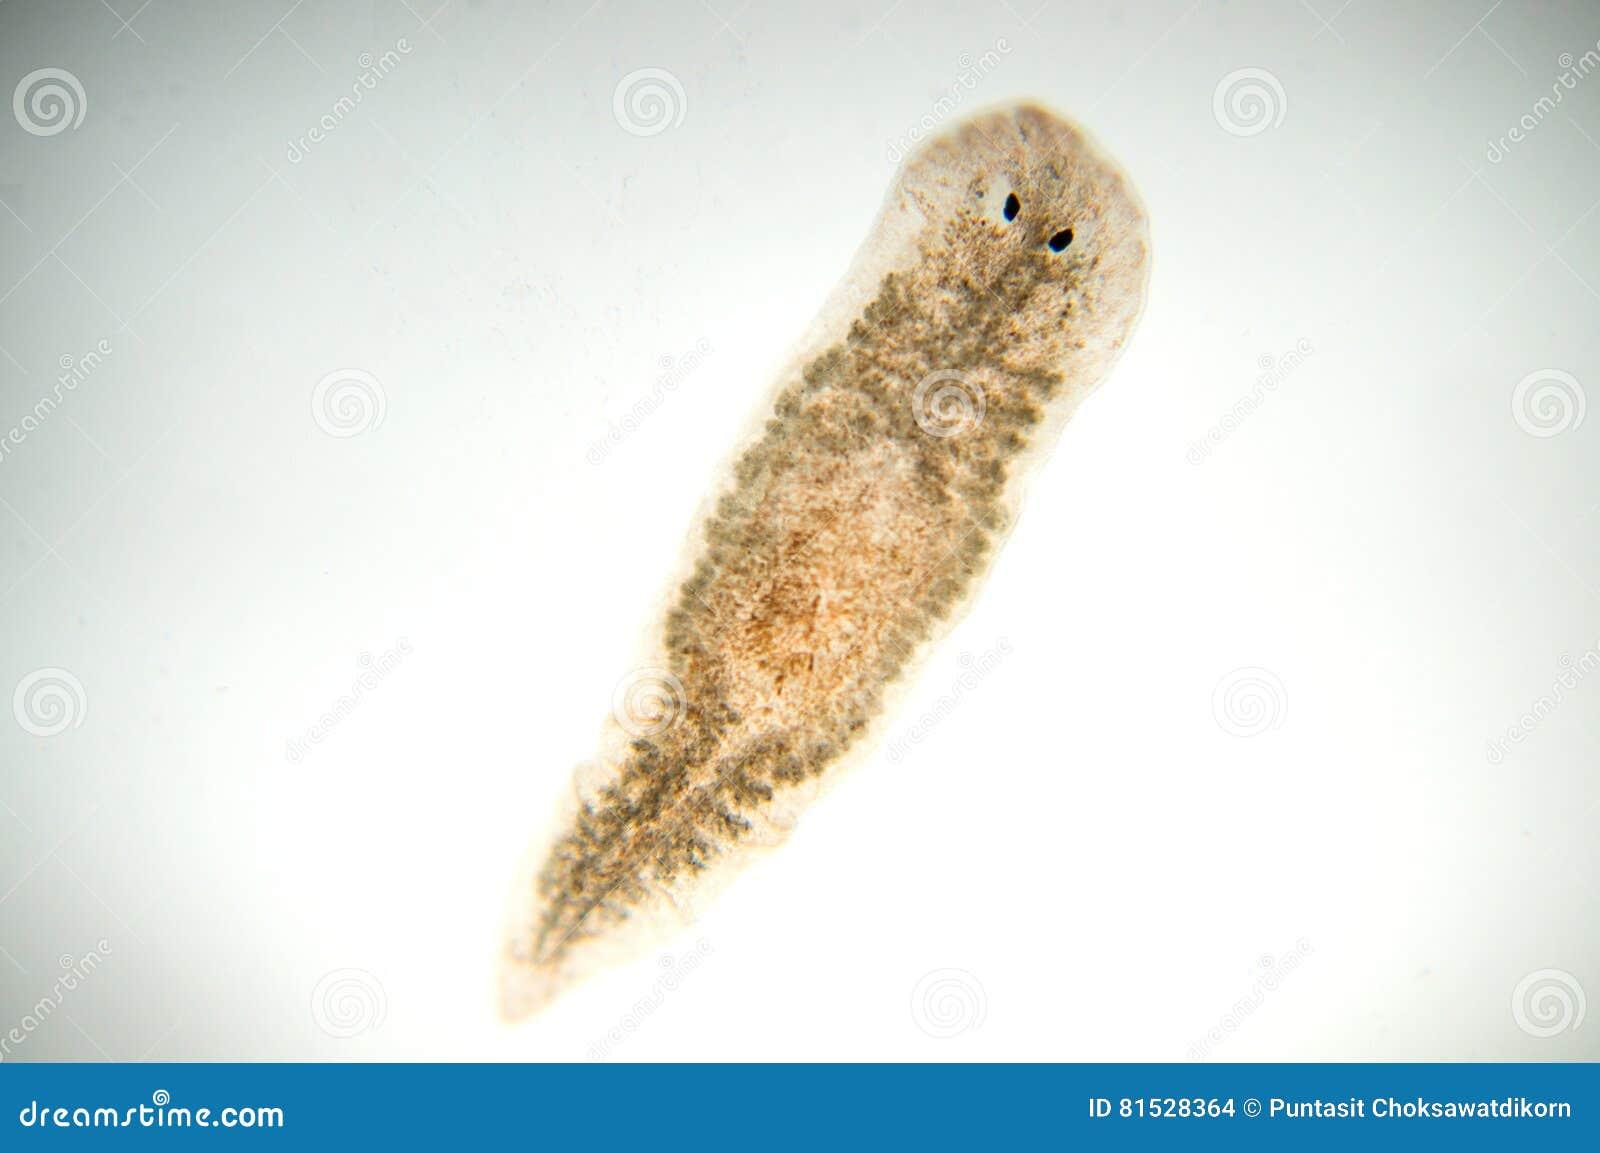 Download Planaria flatworm stock photo. Image of jungle, pond - 81528364